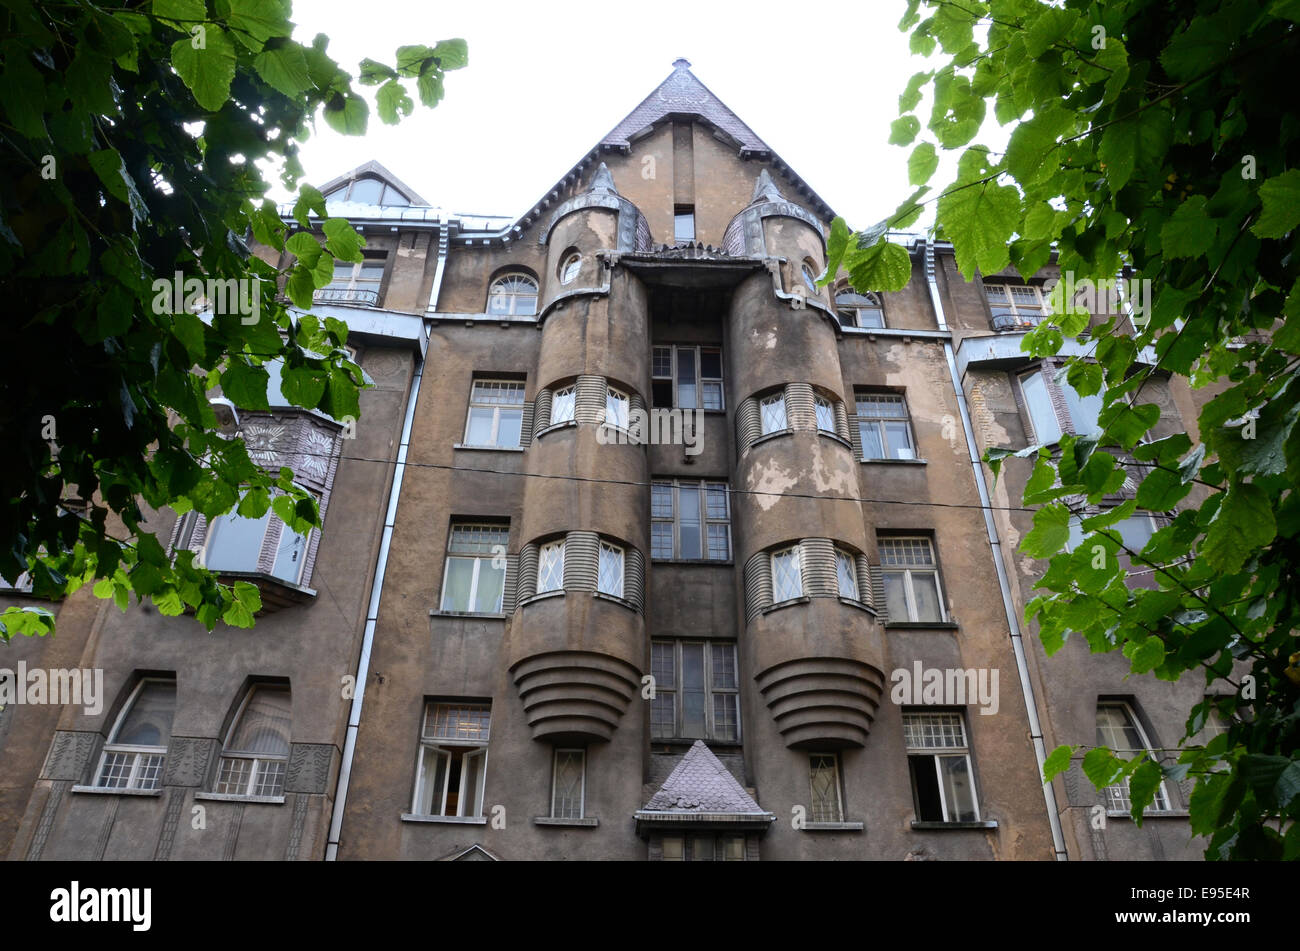 Strēlnieku iela 9, Rīga, LV-1010, Latvia art deco building - Stock Image